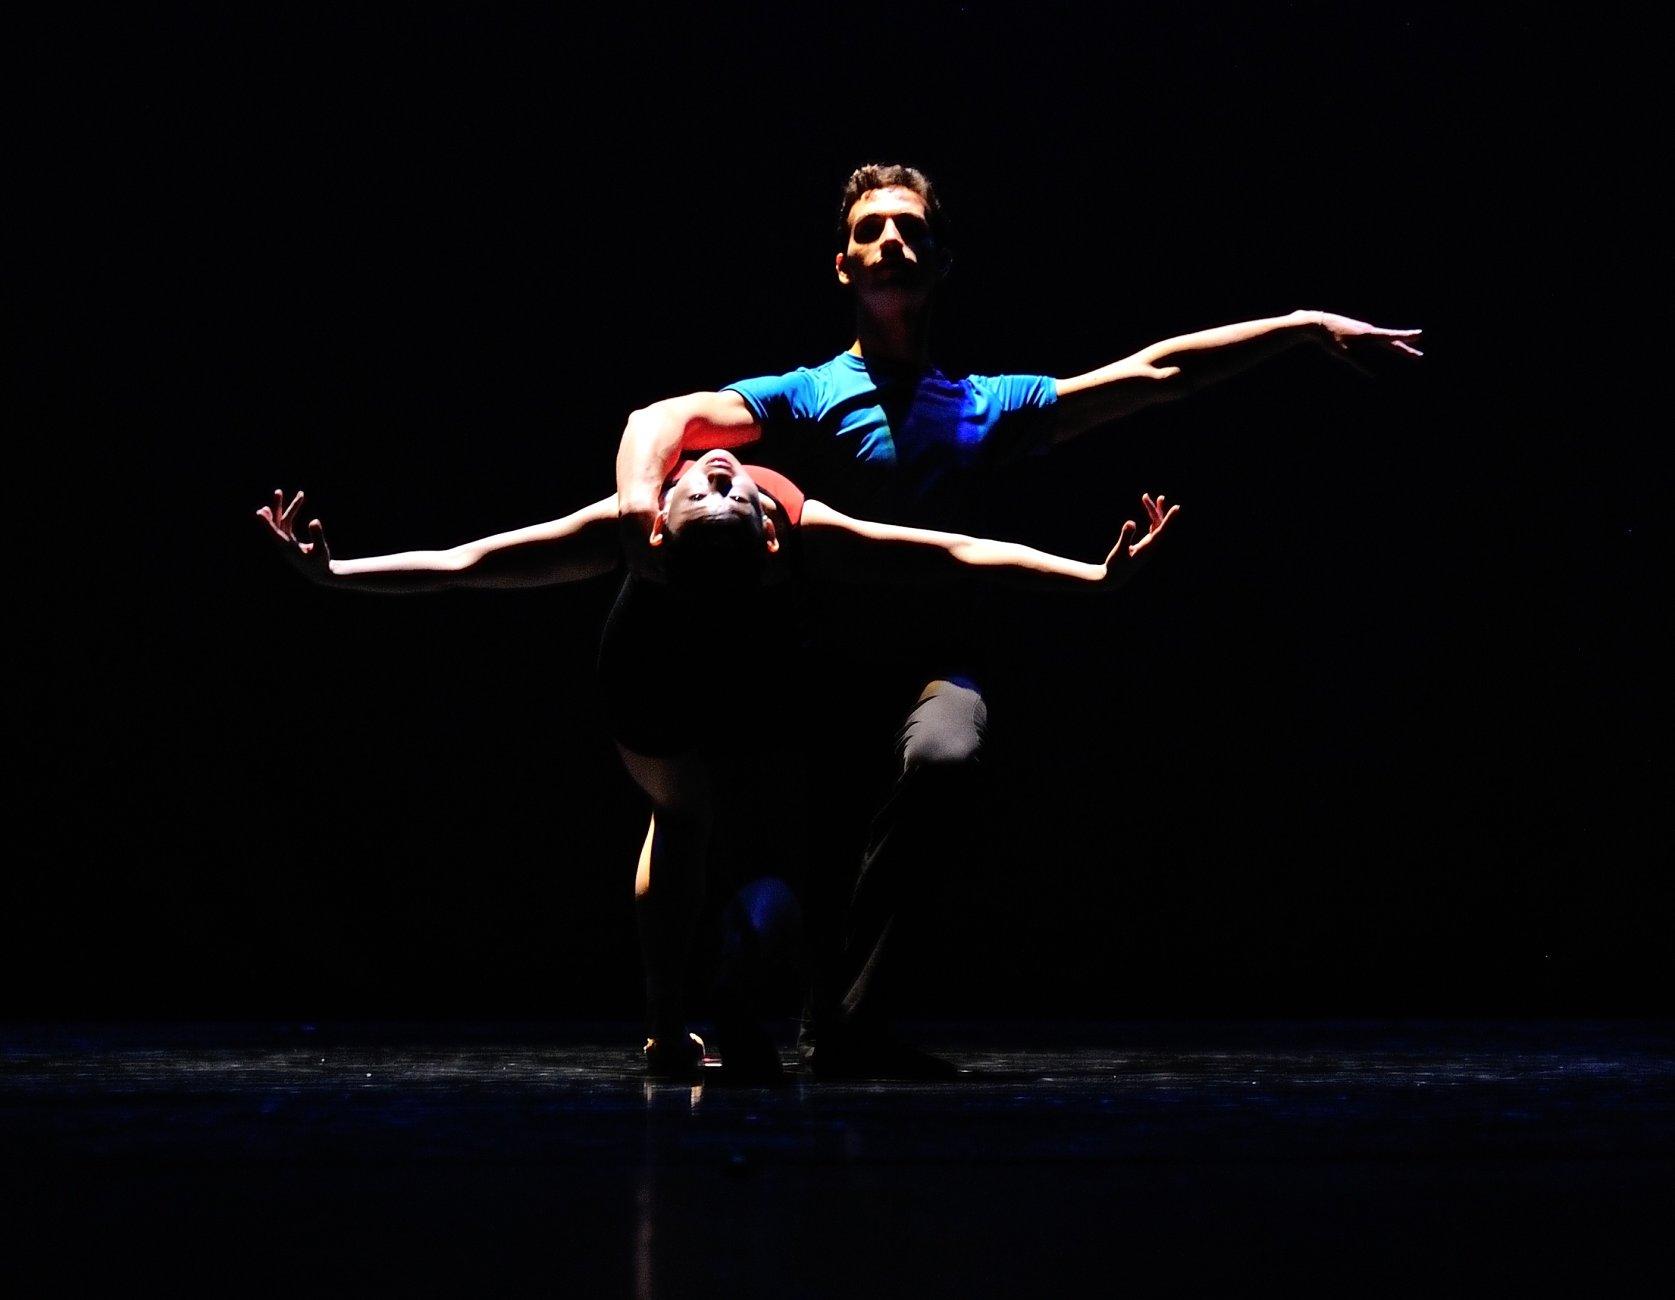 Yiu Watanabe and Davide Lampis